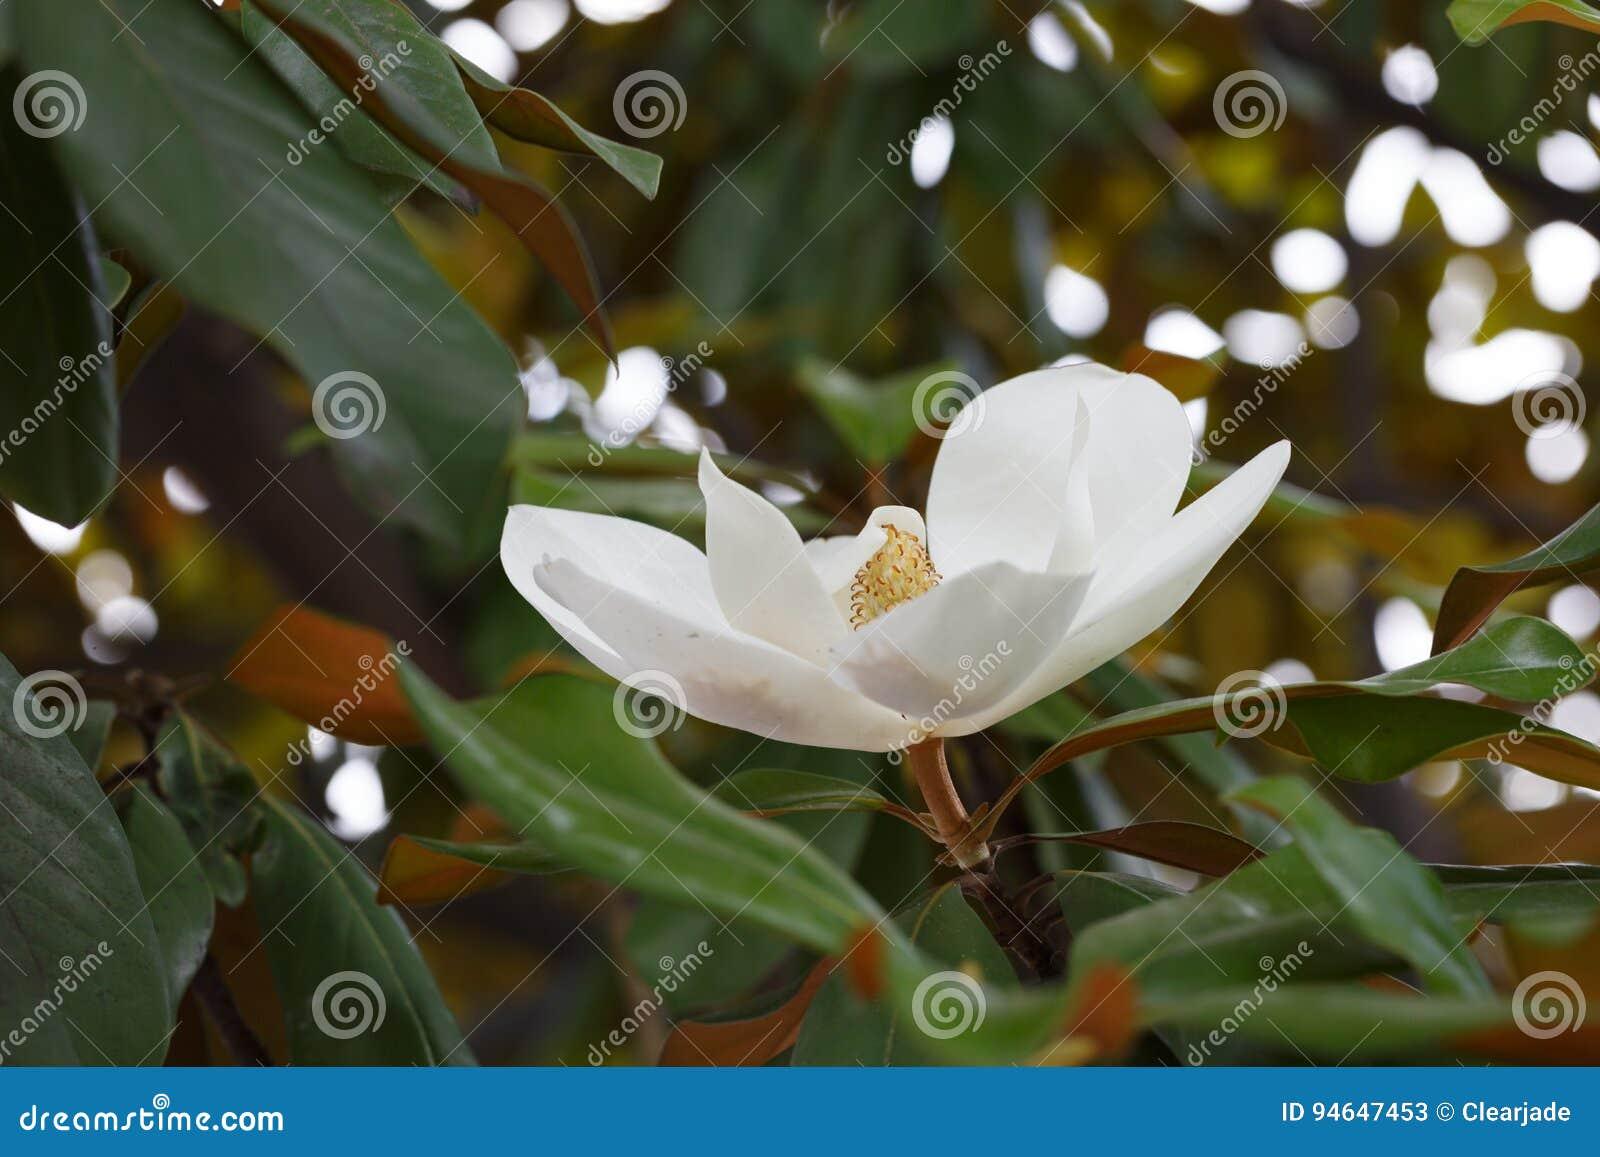 Magnolia white flower in full bloom stock image image of medicine download magnolia white flower in full bloom stock image image of medicine trees mightylinksfo